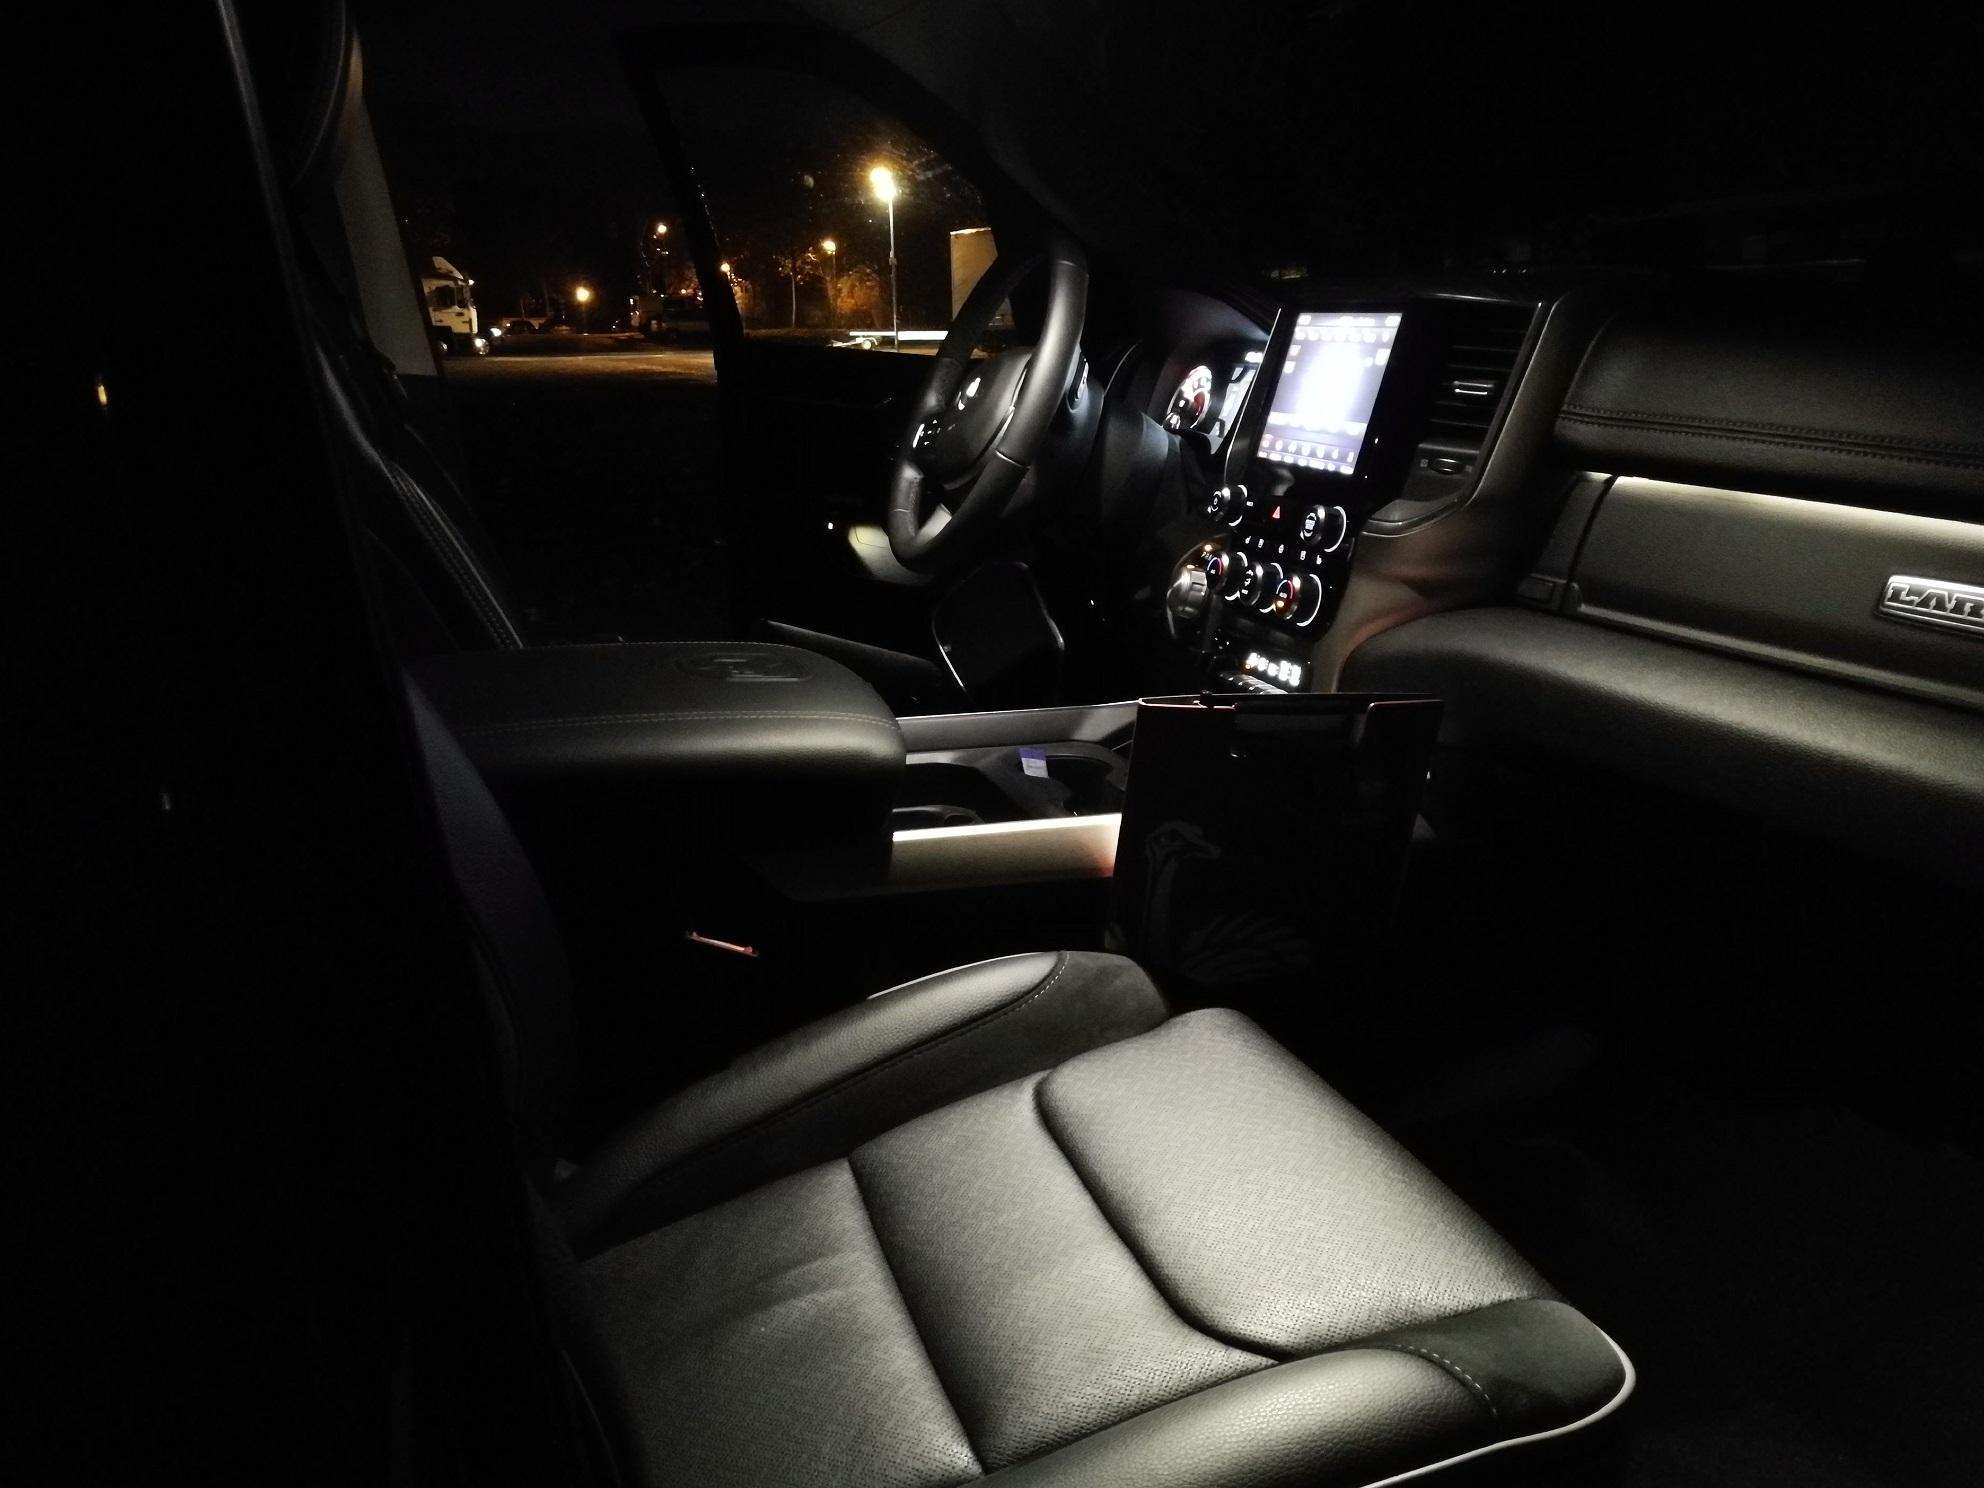 RAM 1500 2019 Innenraum Cockpit bei Nacht